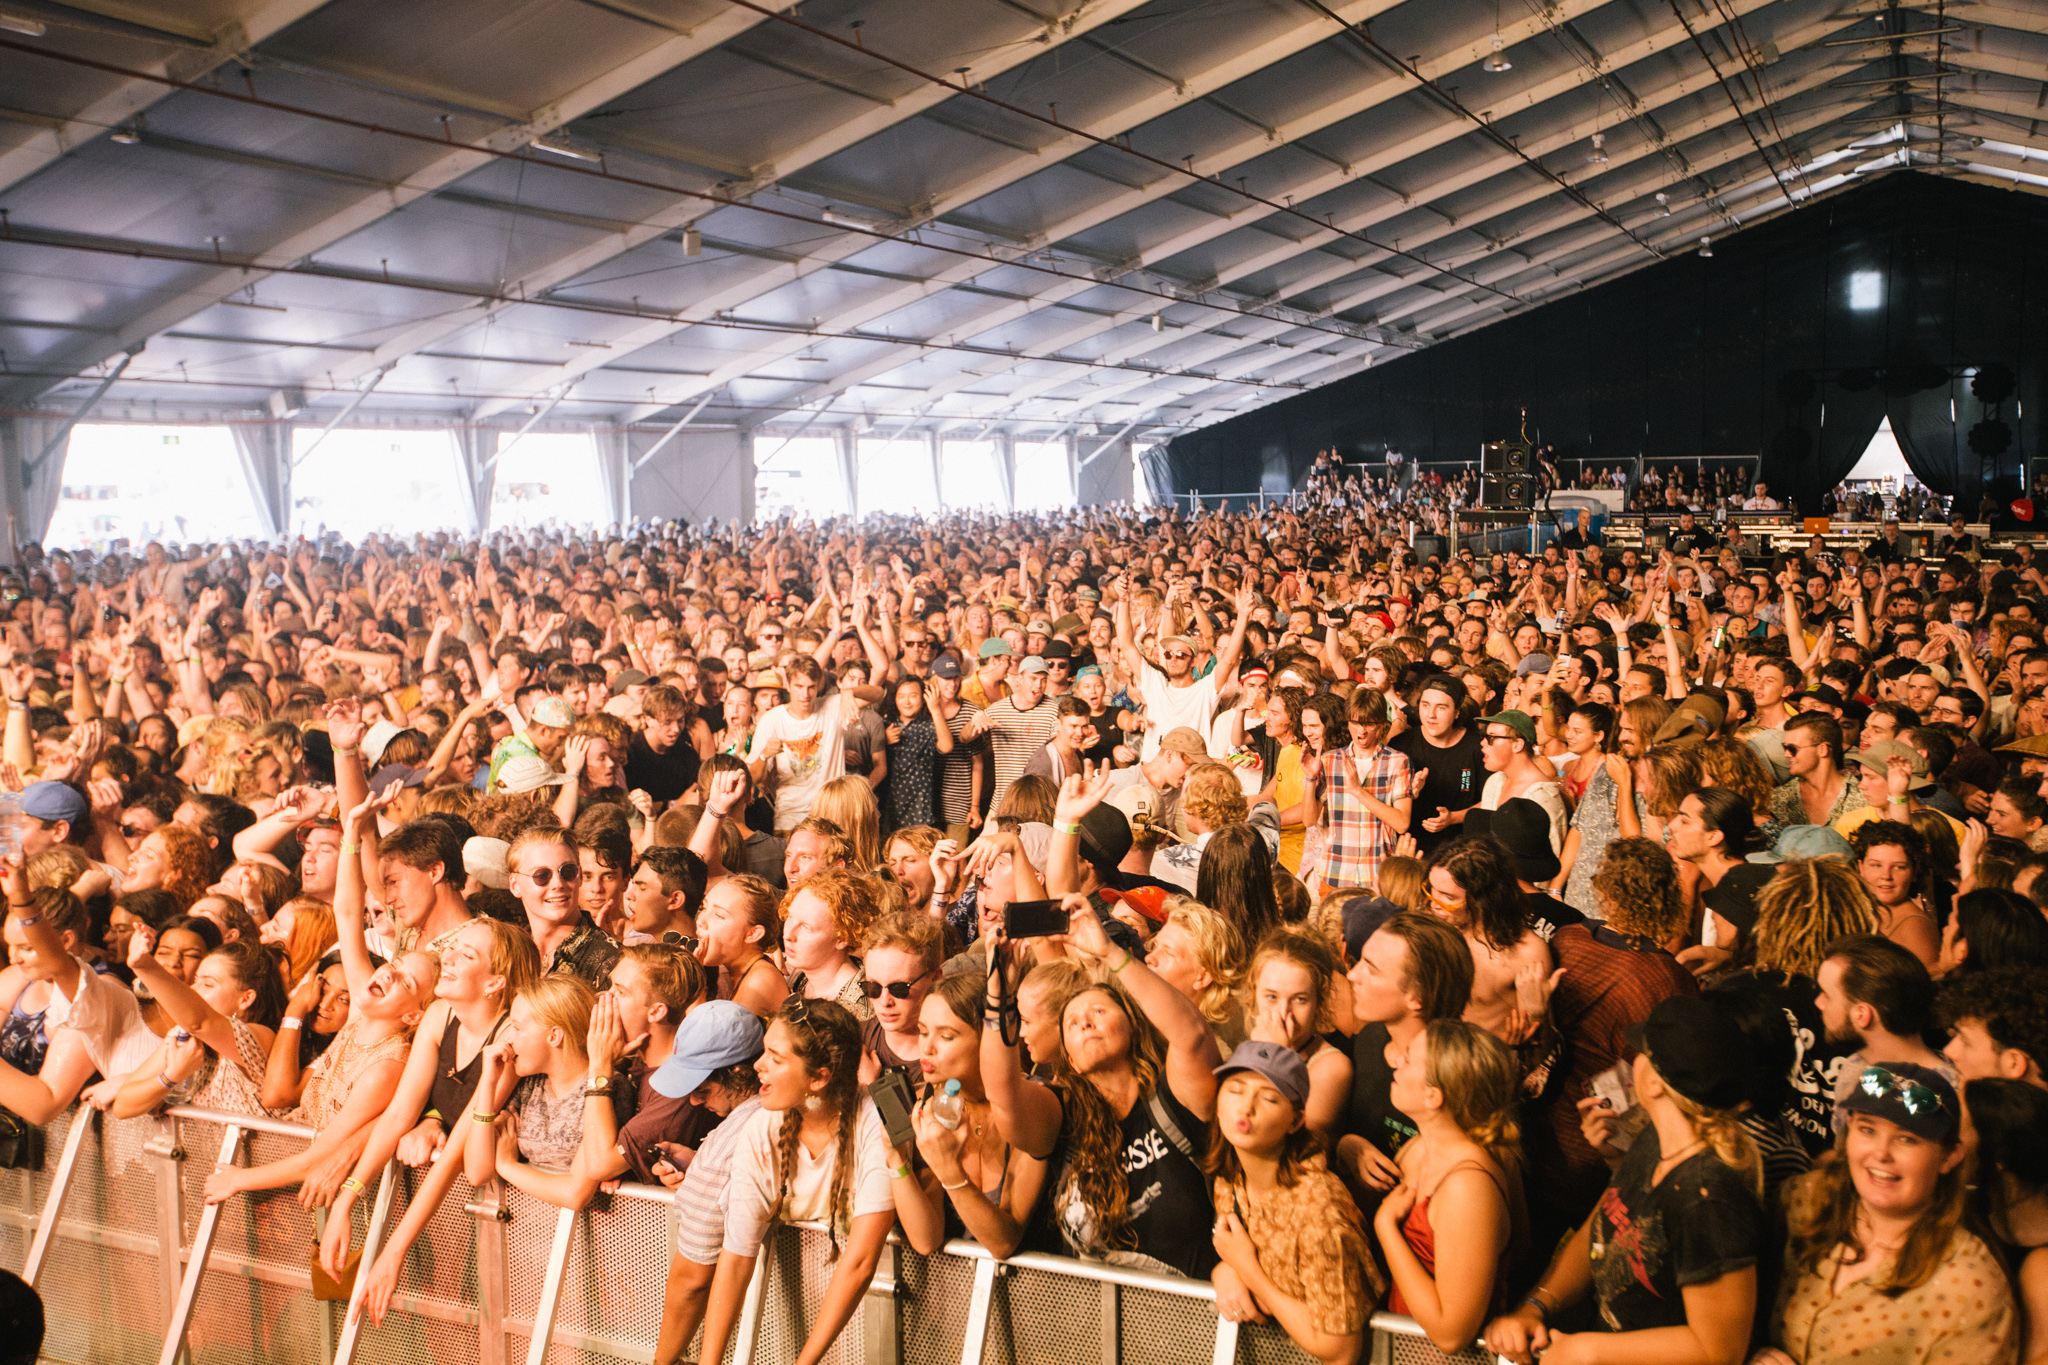 Atmosphere_Laneway-Festival-Brisbane-2017_credit-Bianca-Holderness-26.jpg